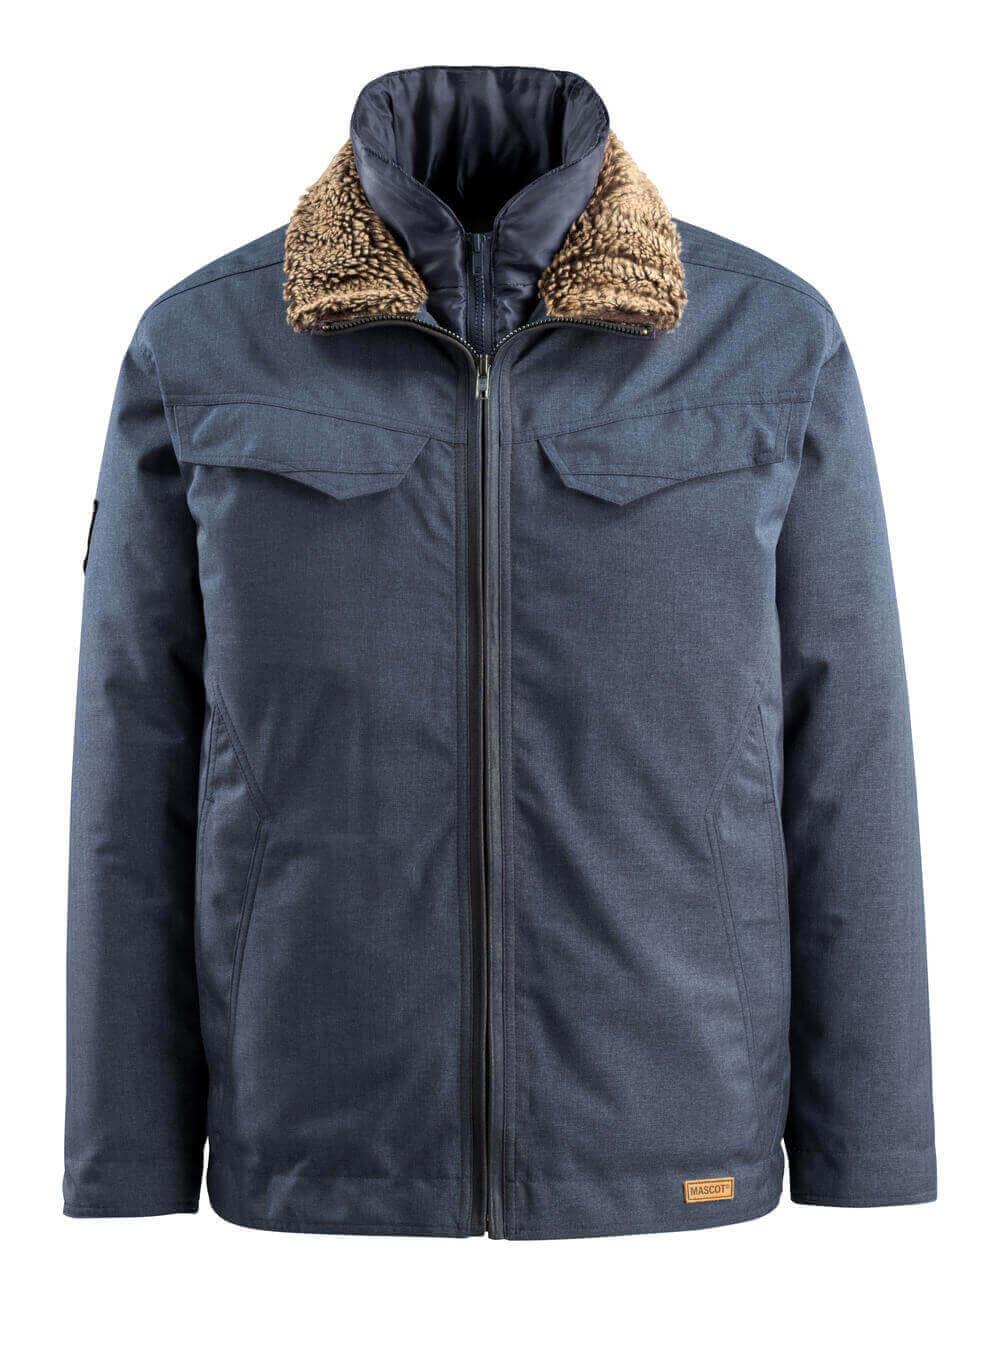 15435-275-46 Winterjas - indigo denimblauw